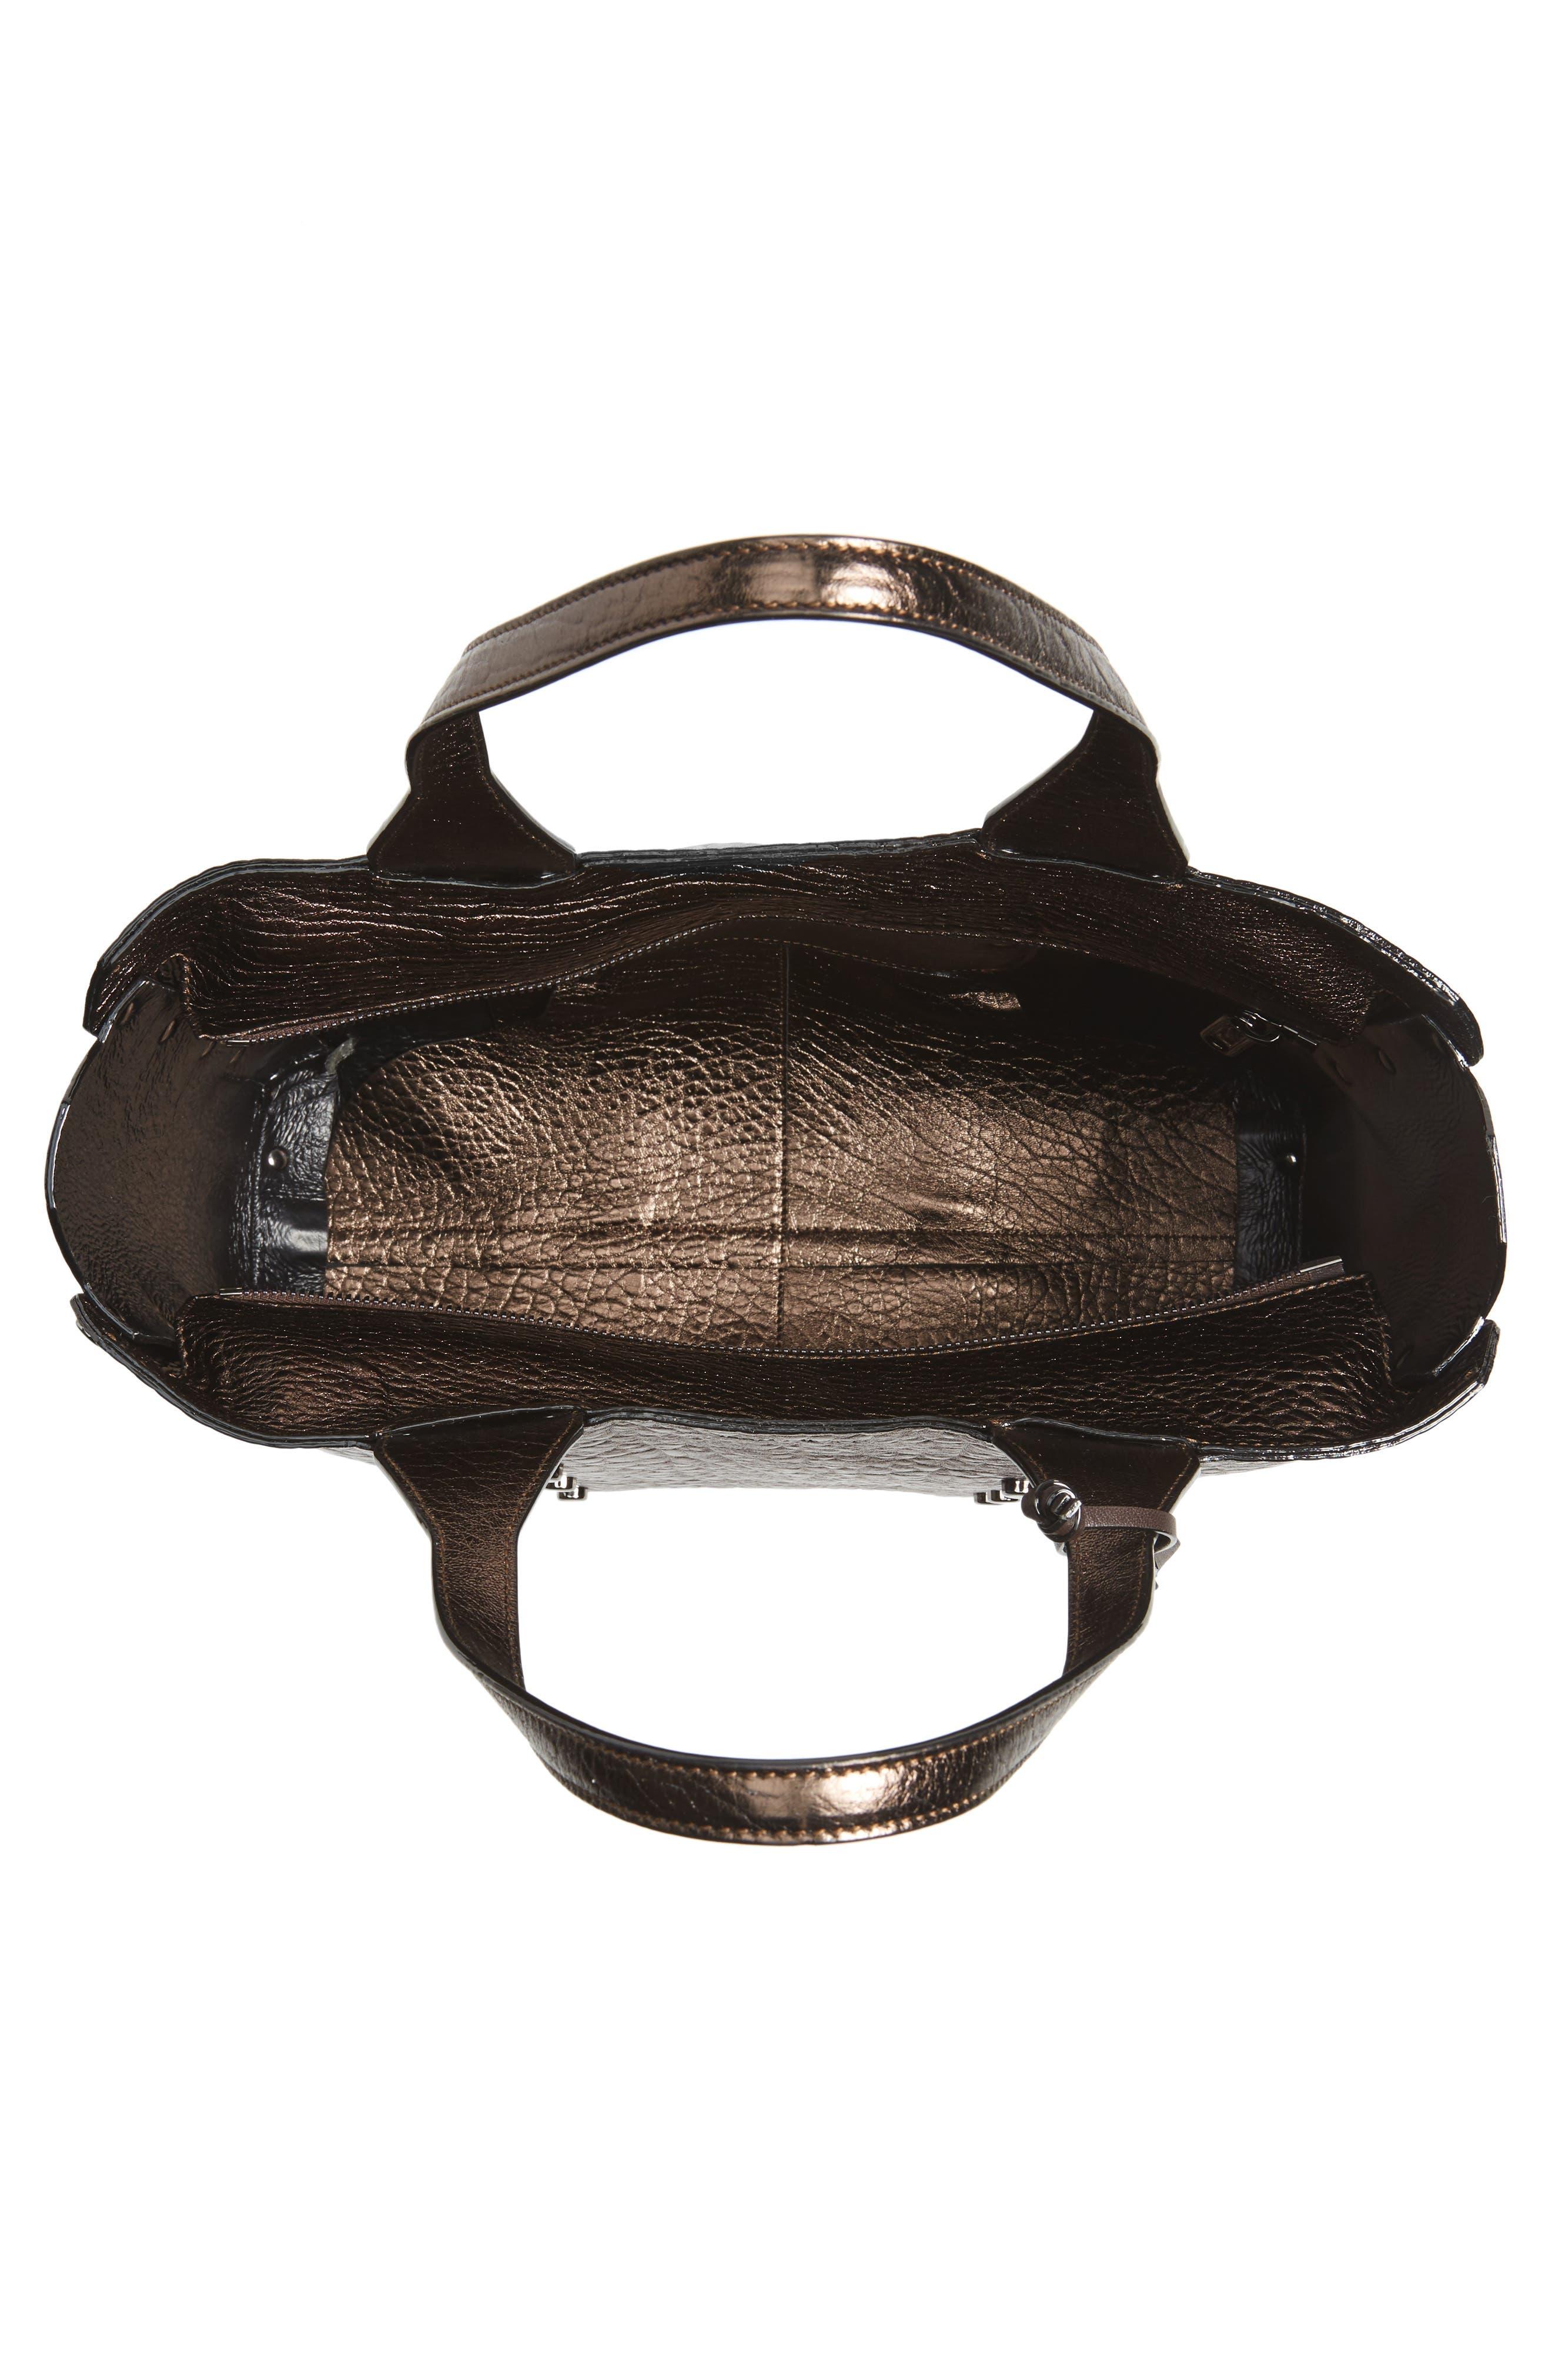 Lockett Metallic Leather Shopper,                             Alternate thumbnail 4, color,                             200